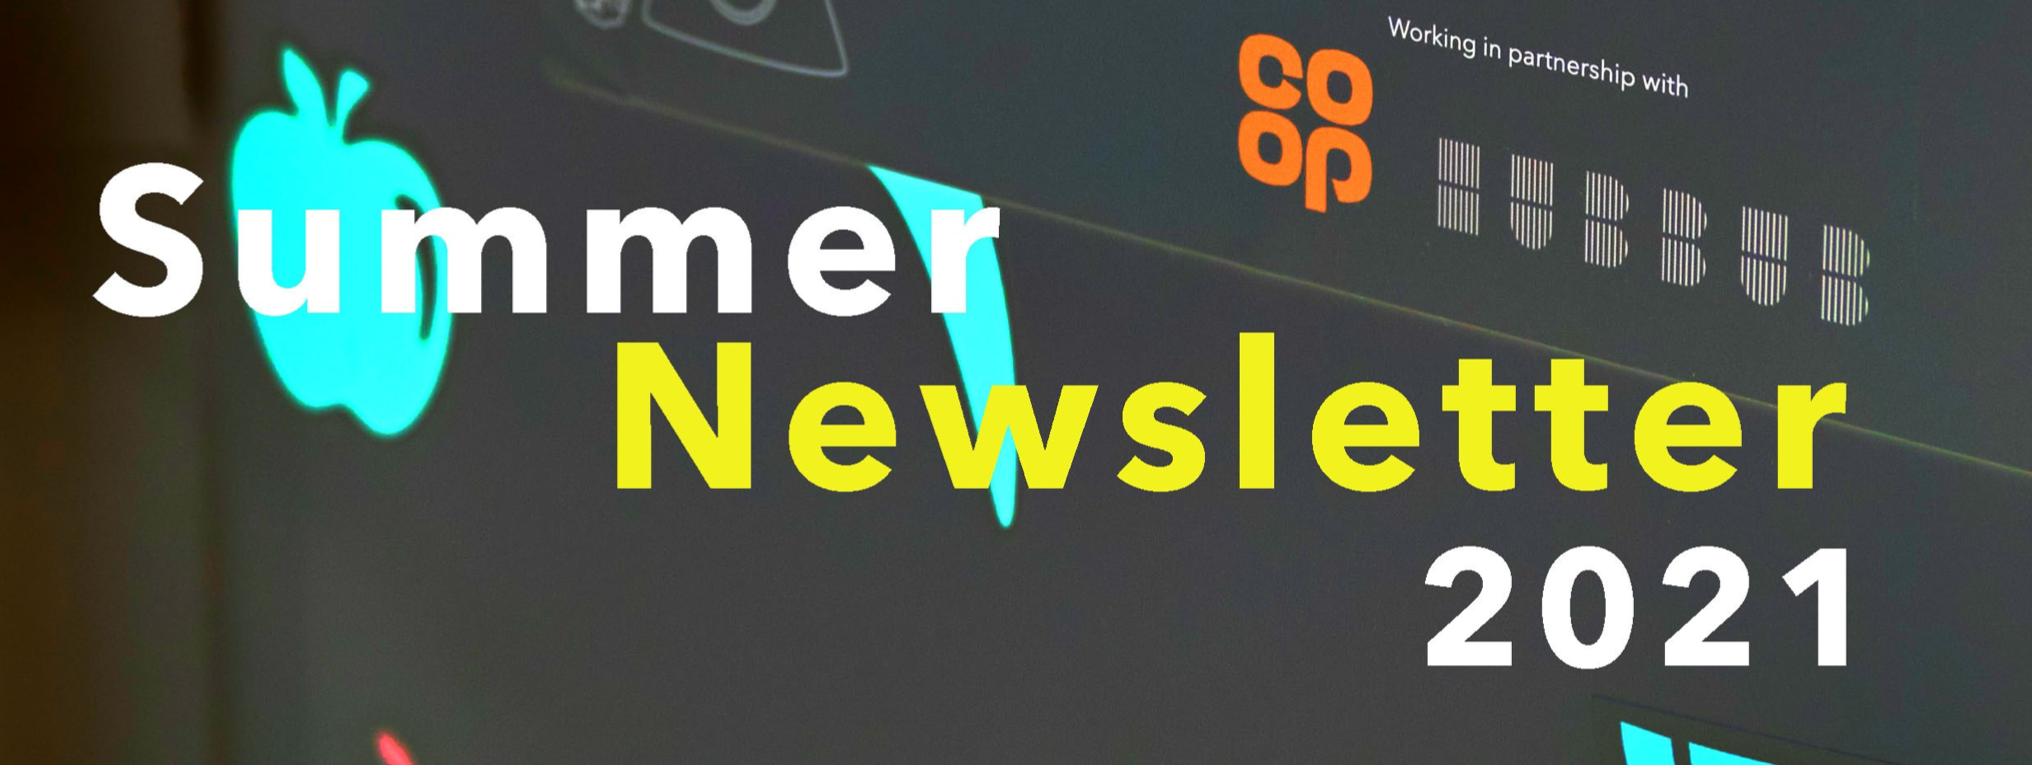 Our Summer Newsletter